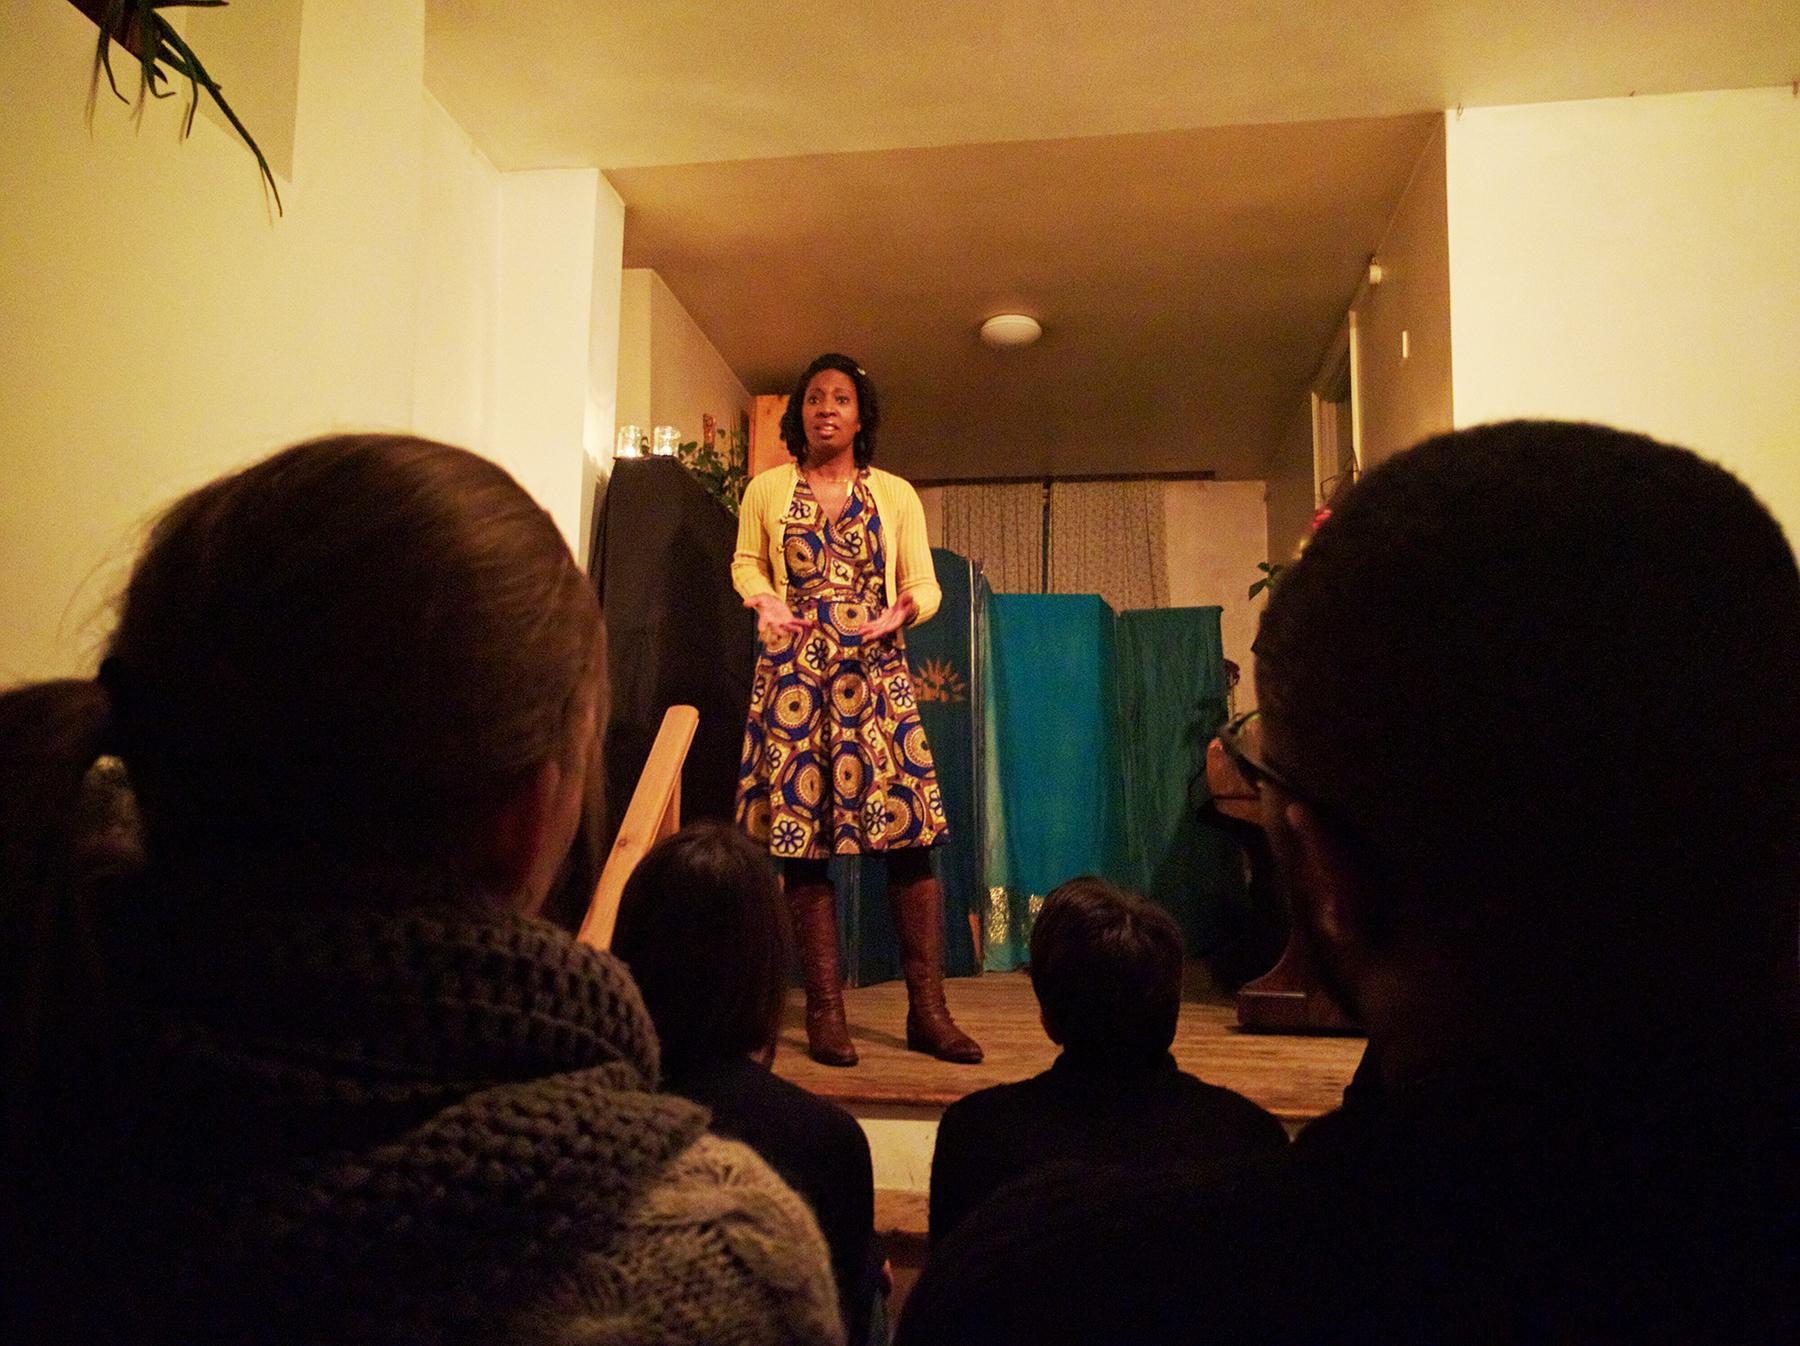 Wendy Shearer storytelling at Torriano Story Night